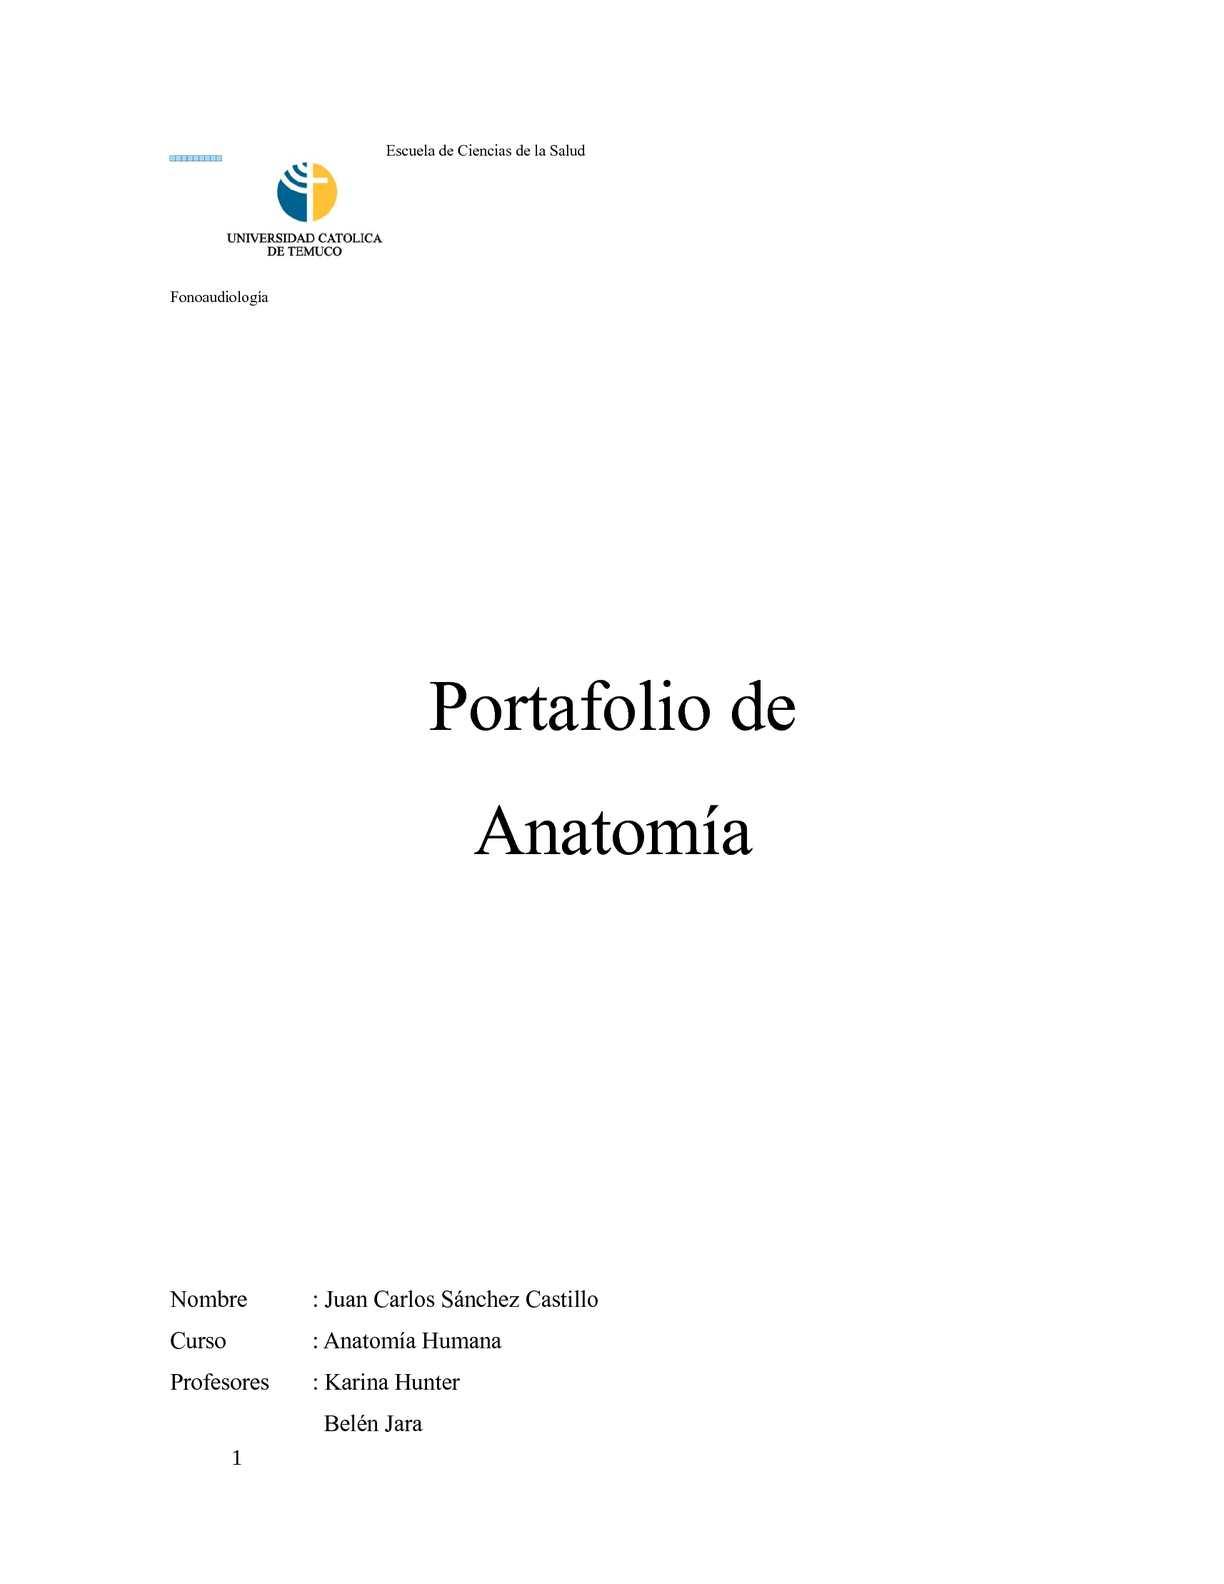 Calaméo - Portafolio Digital Anatomía Humana - Juan Carlos Sánchez ...